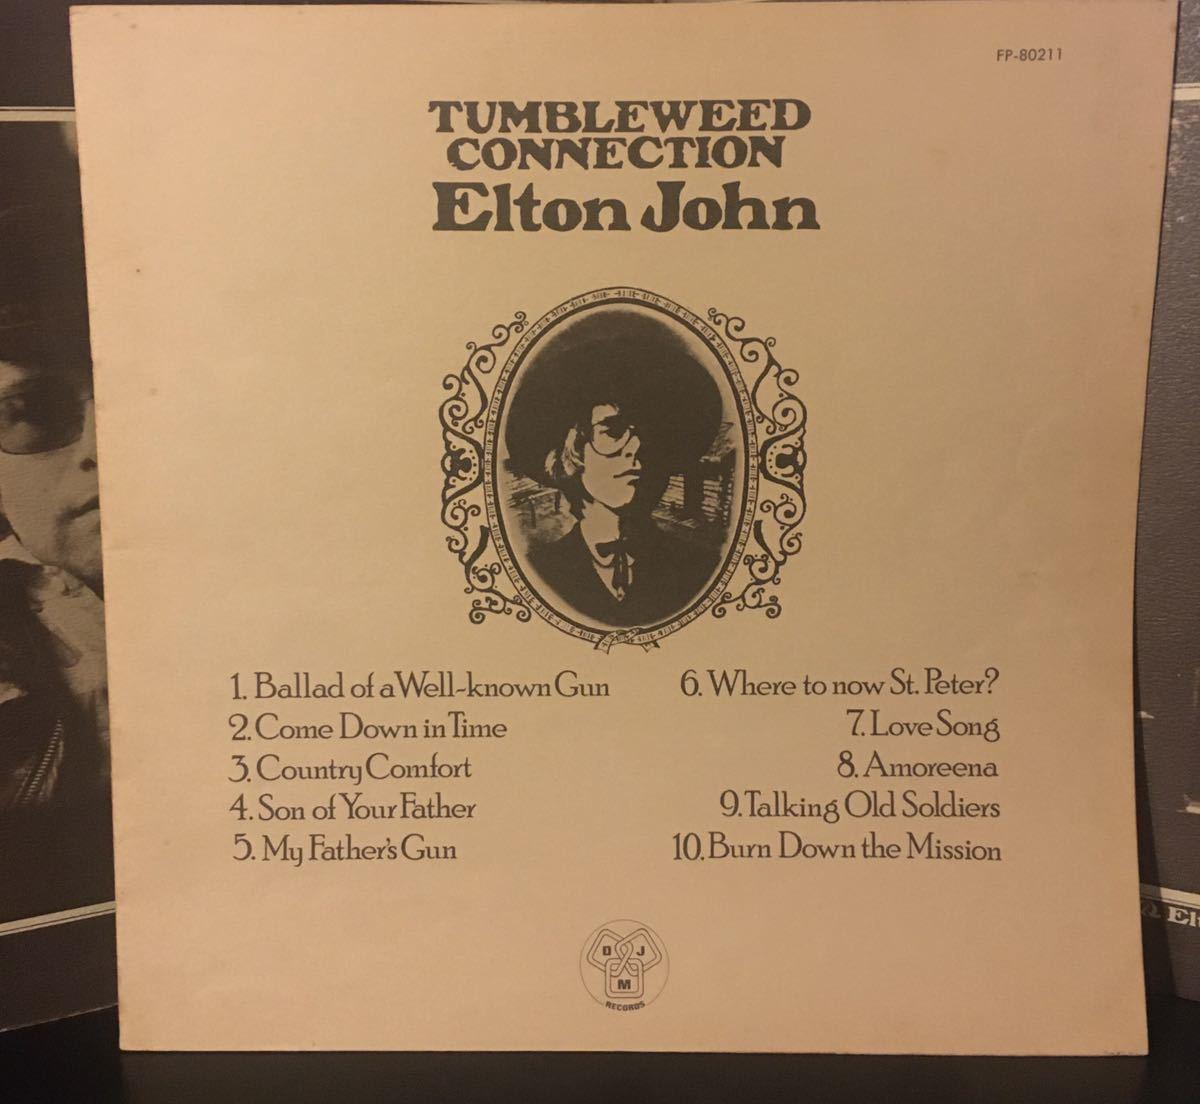 Elton John / Tumbleweed Connection ロック名盤 廃盤 エルトン・ジョン レコード LP 日本盤 再発 クリアレッド_画像3